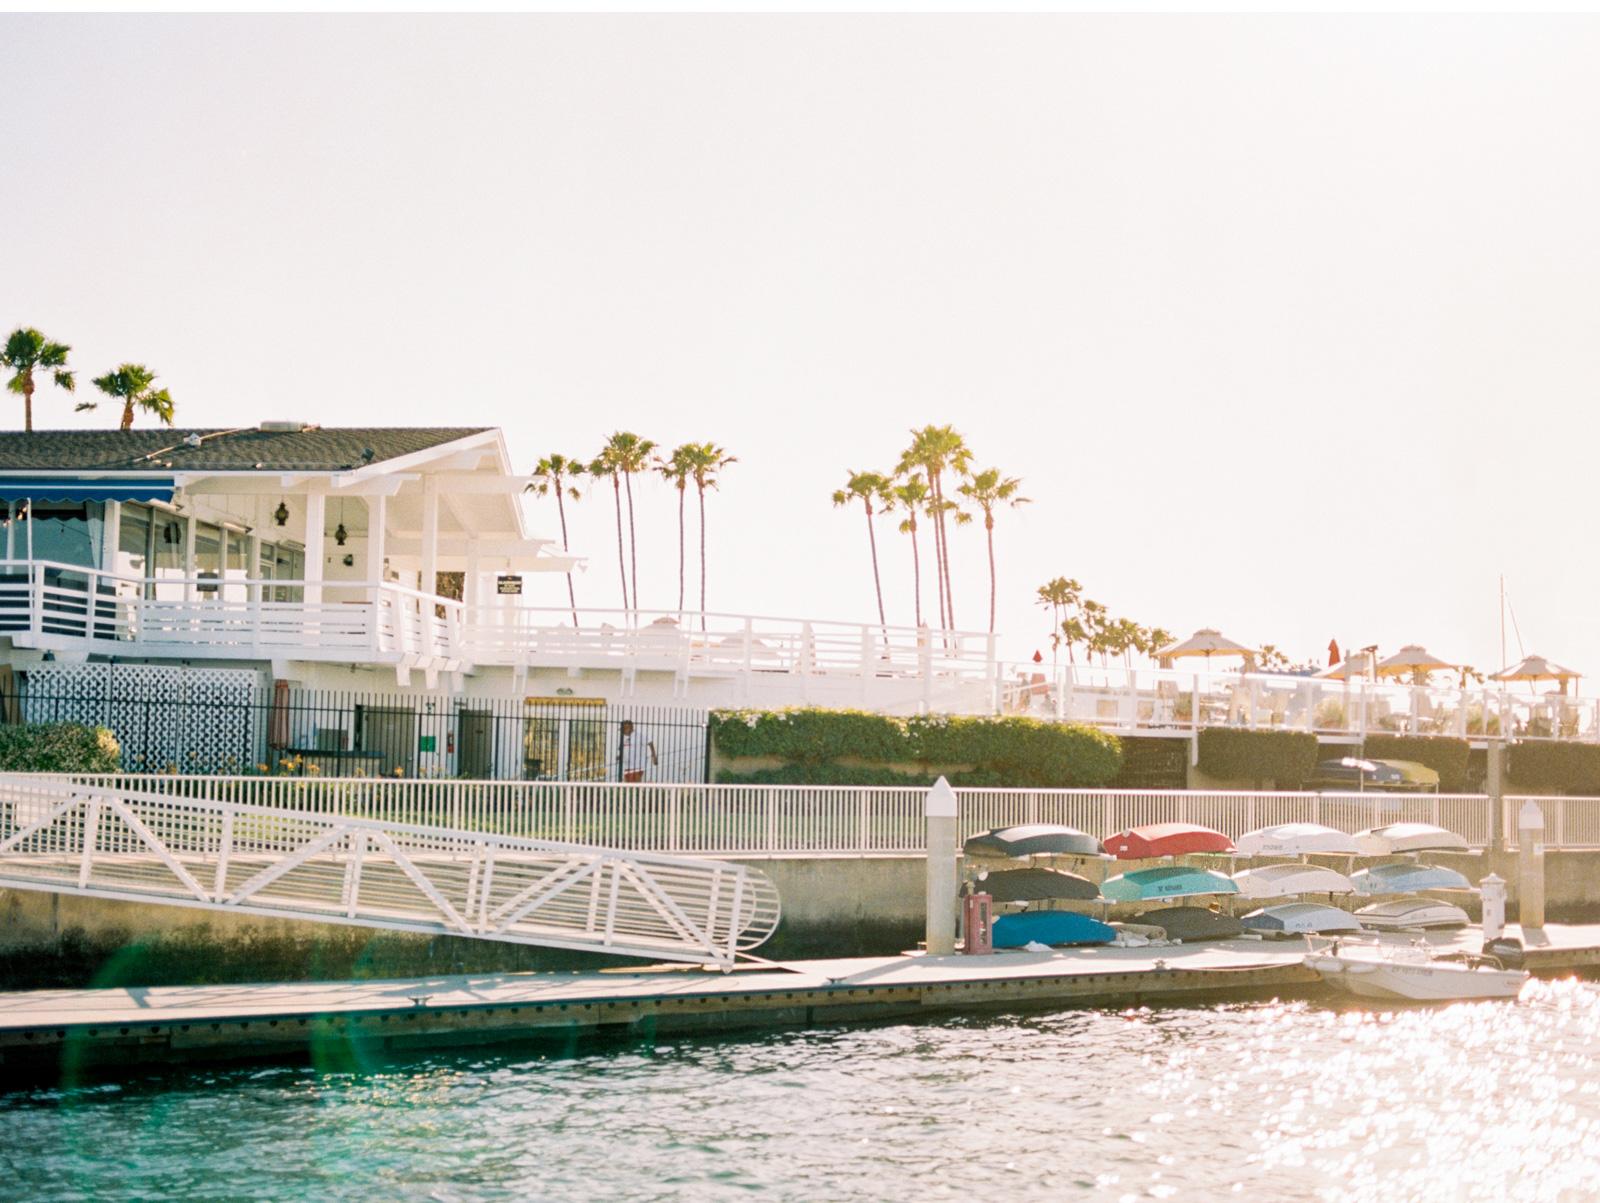 Anniversaries-on-the-Water-Long-Beach-Anniversary-Southern-California-Wedding-Photographer-Fine-Art-Wedding-Photos-Anniversary-on-Boat-Natalie-Schutt-Photography_08.jpg